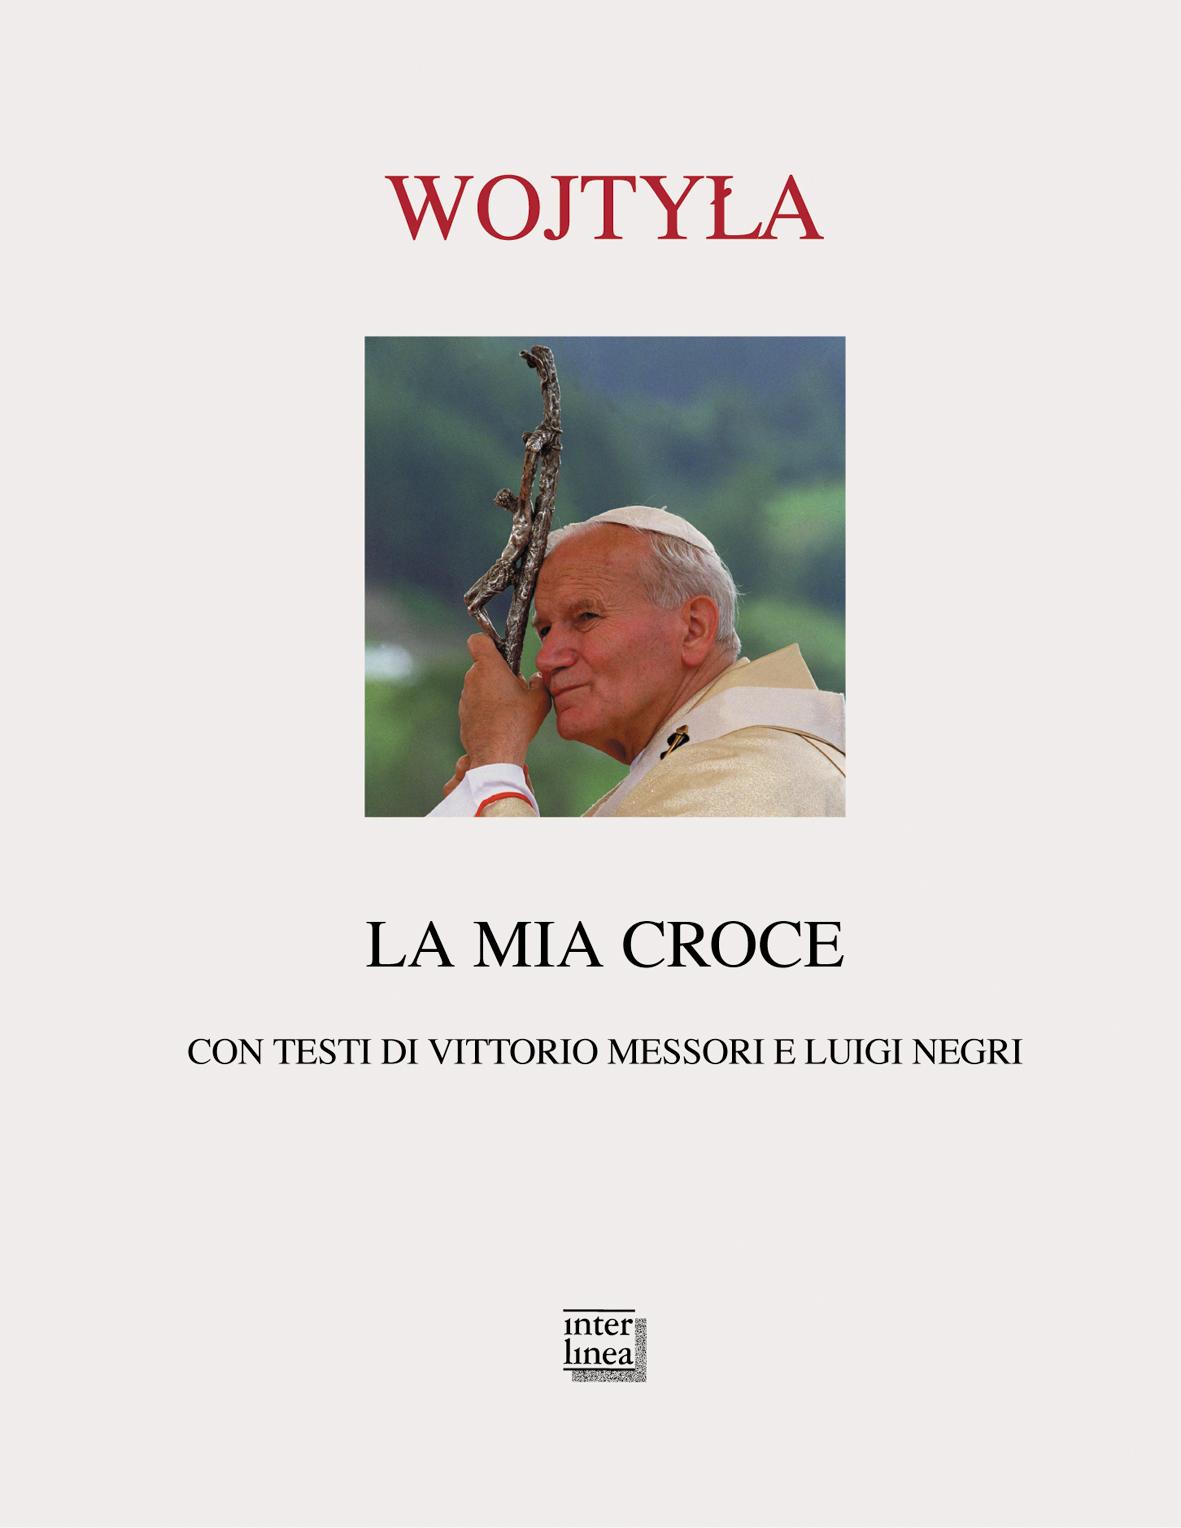 La mia croce di Karol Wojtyla